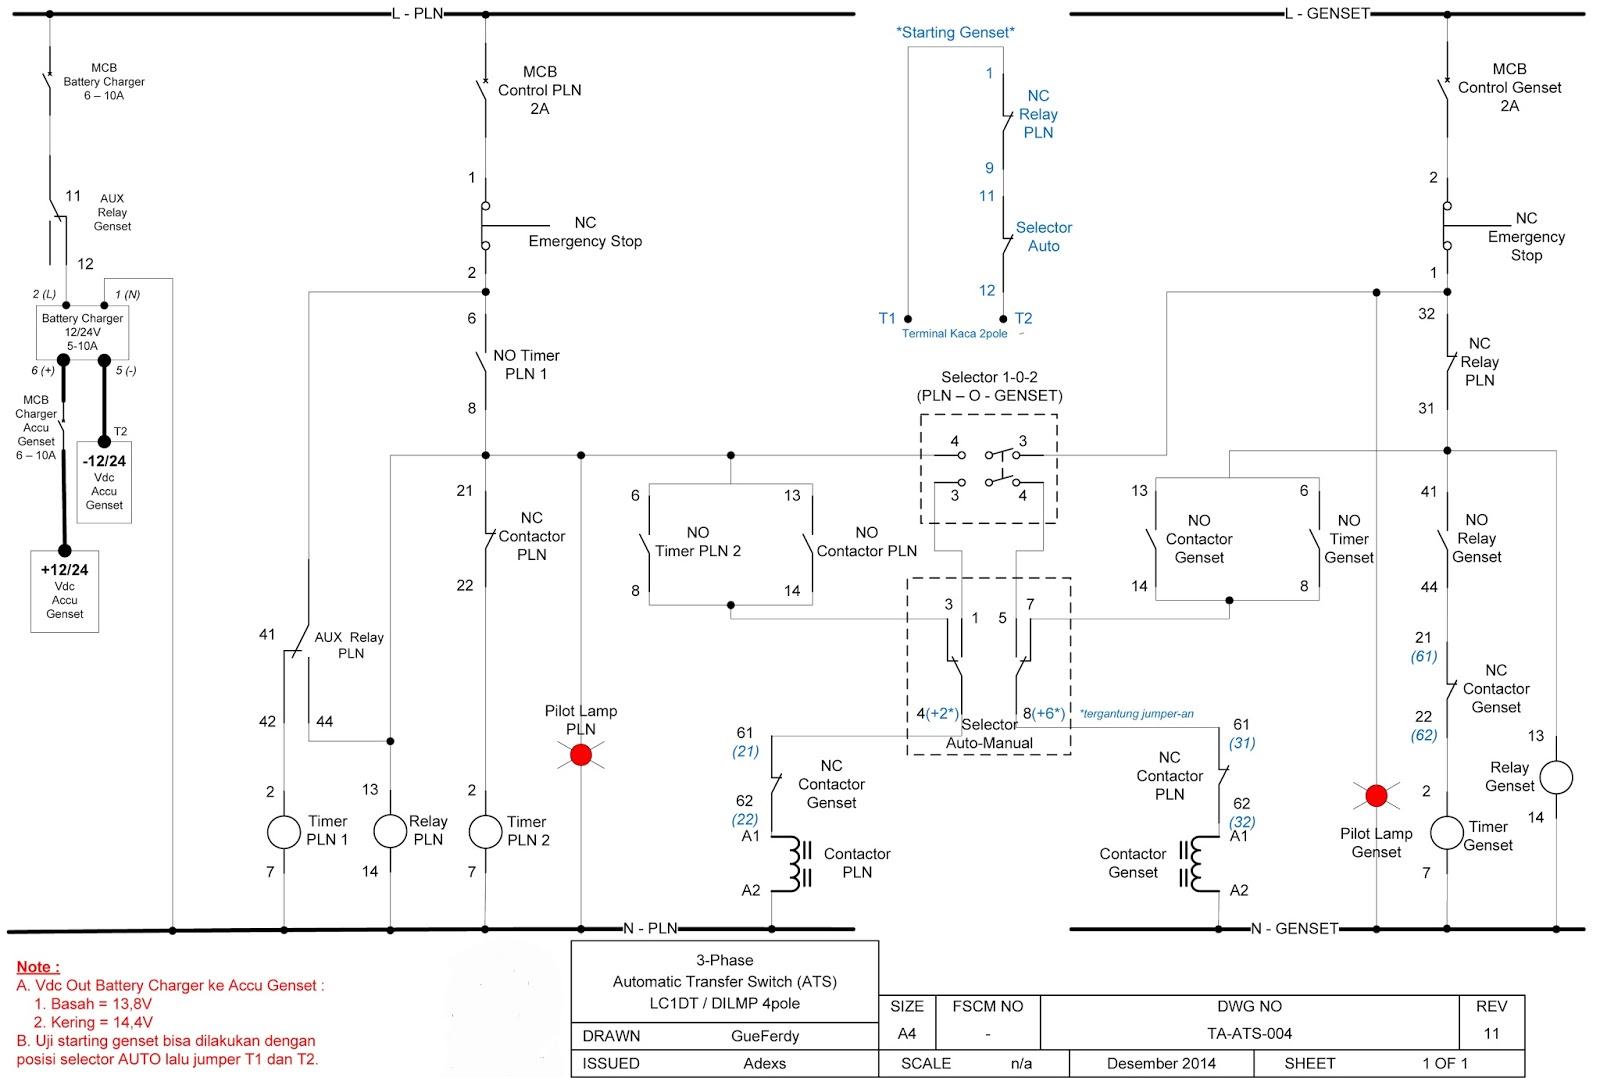 Wiring diagram panel ats genset wiring wiring diagram panel otomatis genset wiring electric circuit panel for generator wiring diagram panel ats genset cheapraybanclubmaster Choice Image